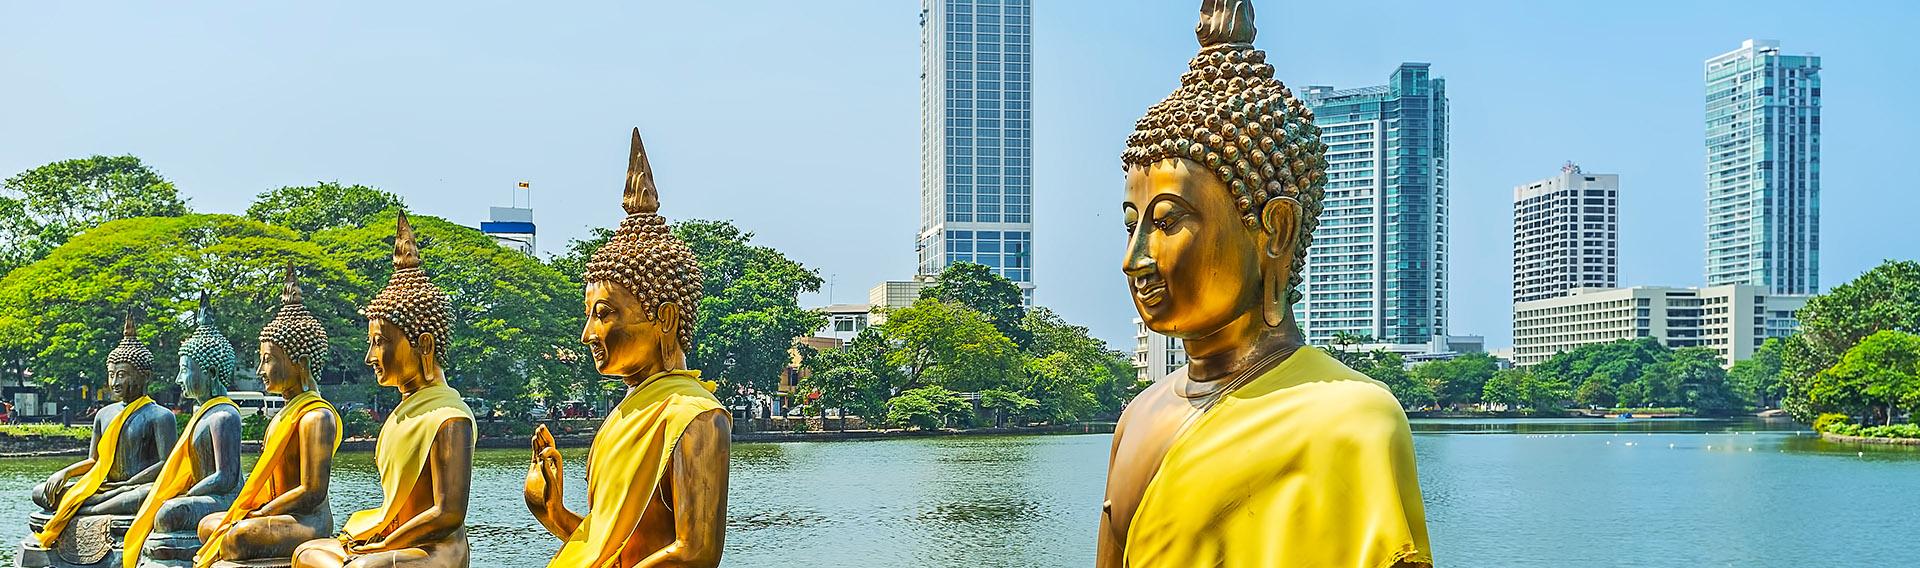 Sri Lanka, visite de la ville de Colombo